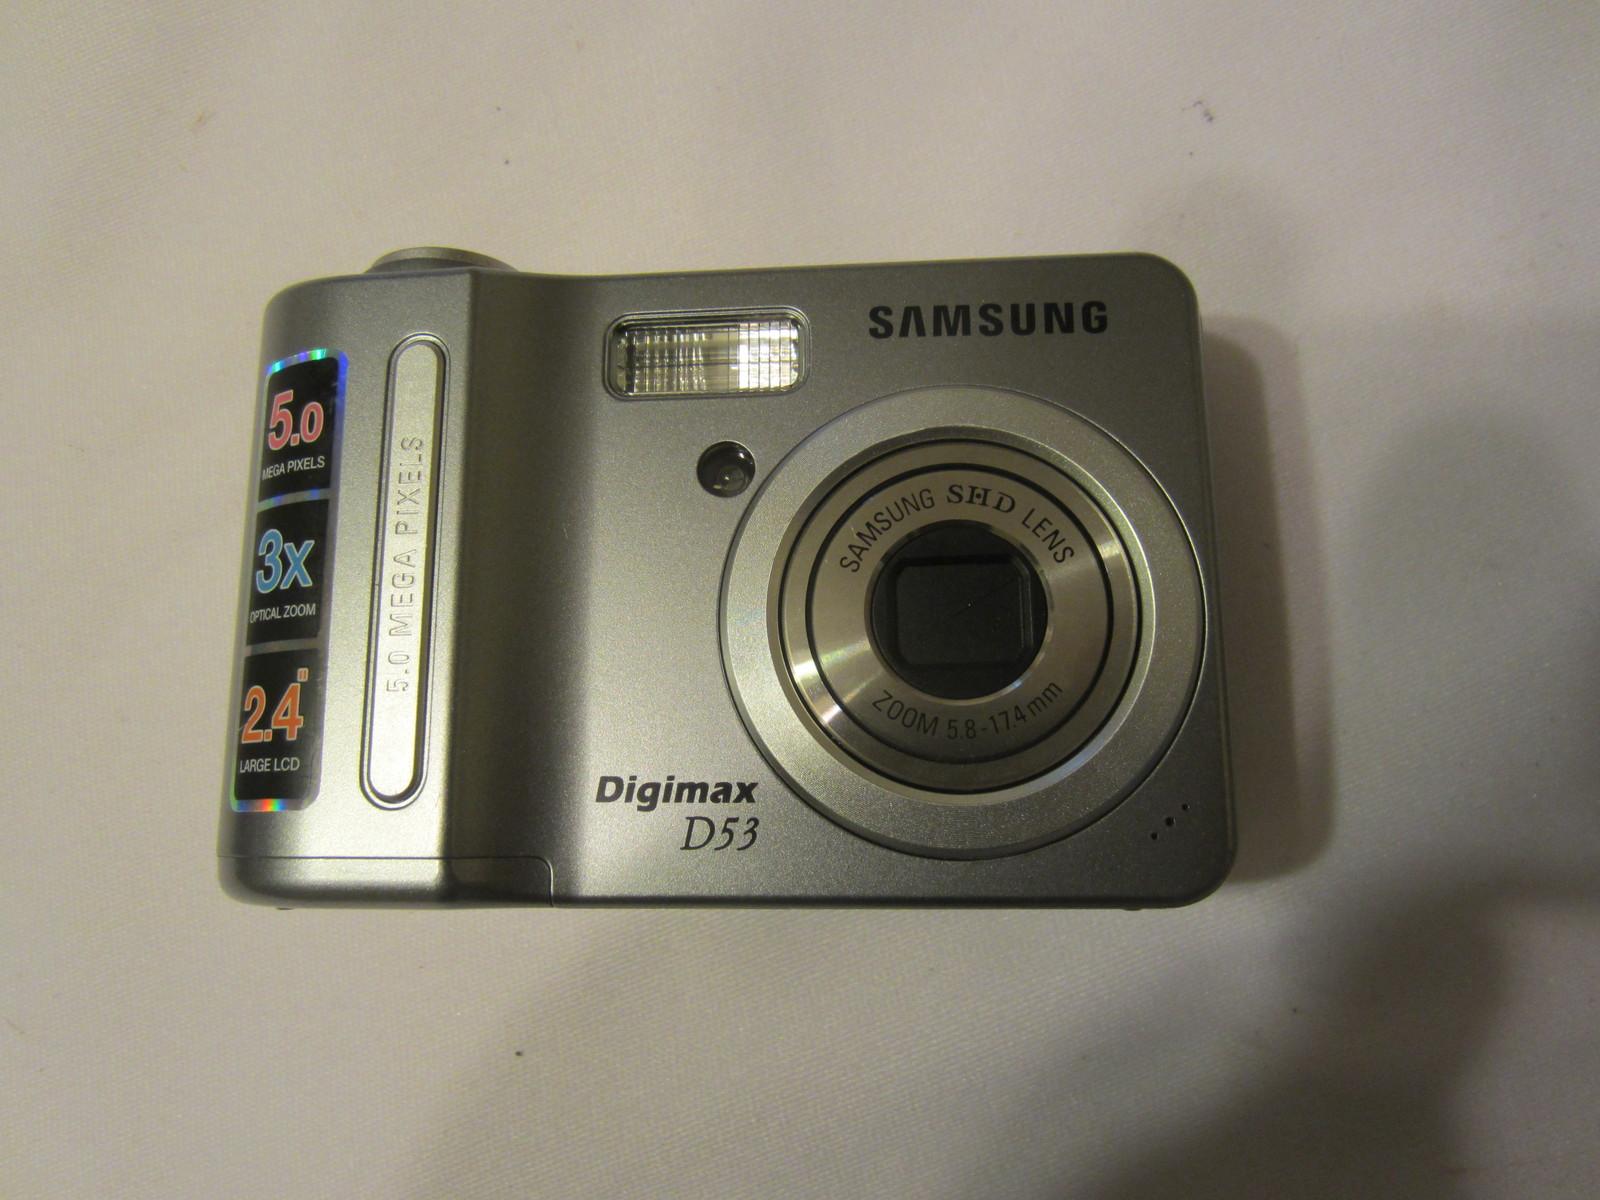 samsung digimax d53 drivers for windows 7 rh macroview info Samsung Digimax A6 Samsung Camera Phone